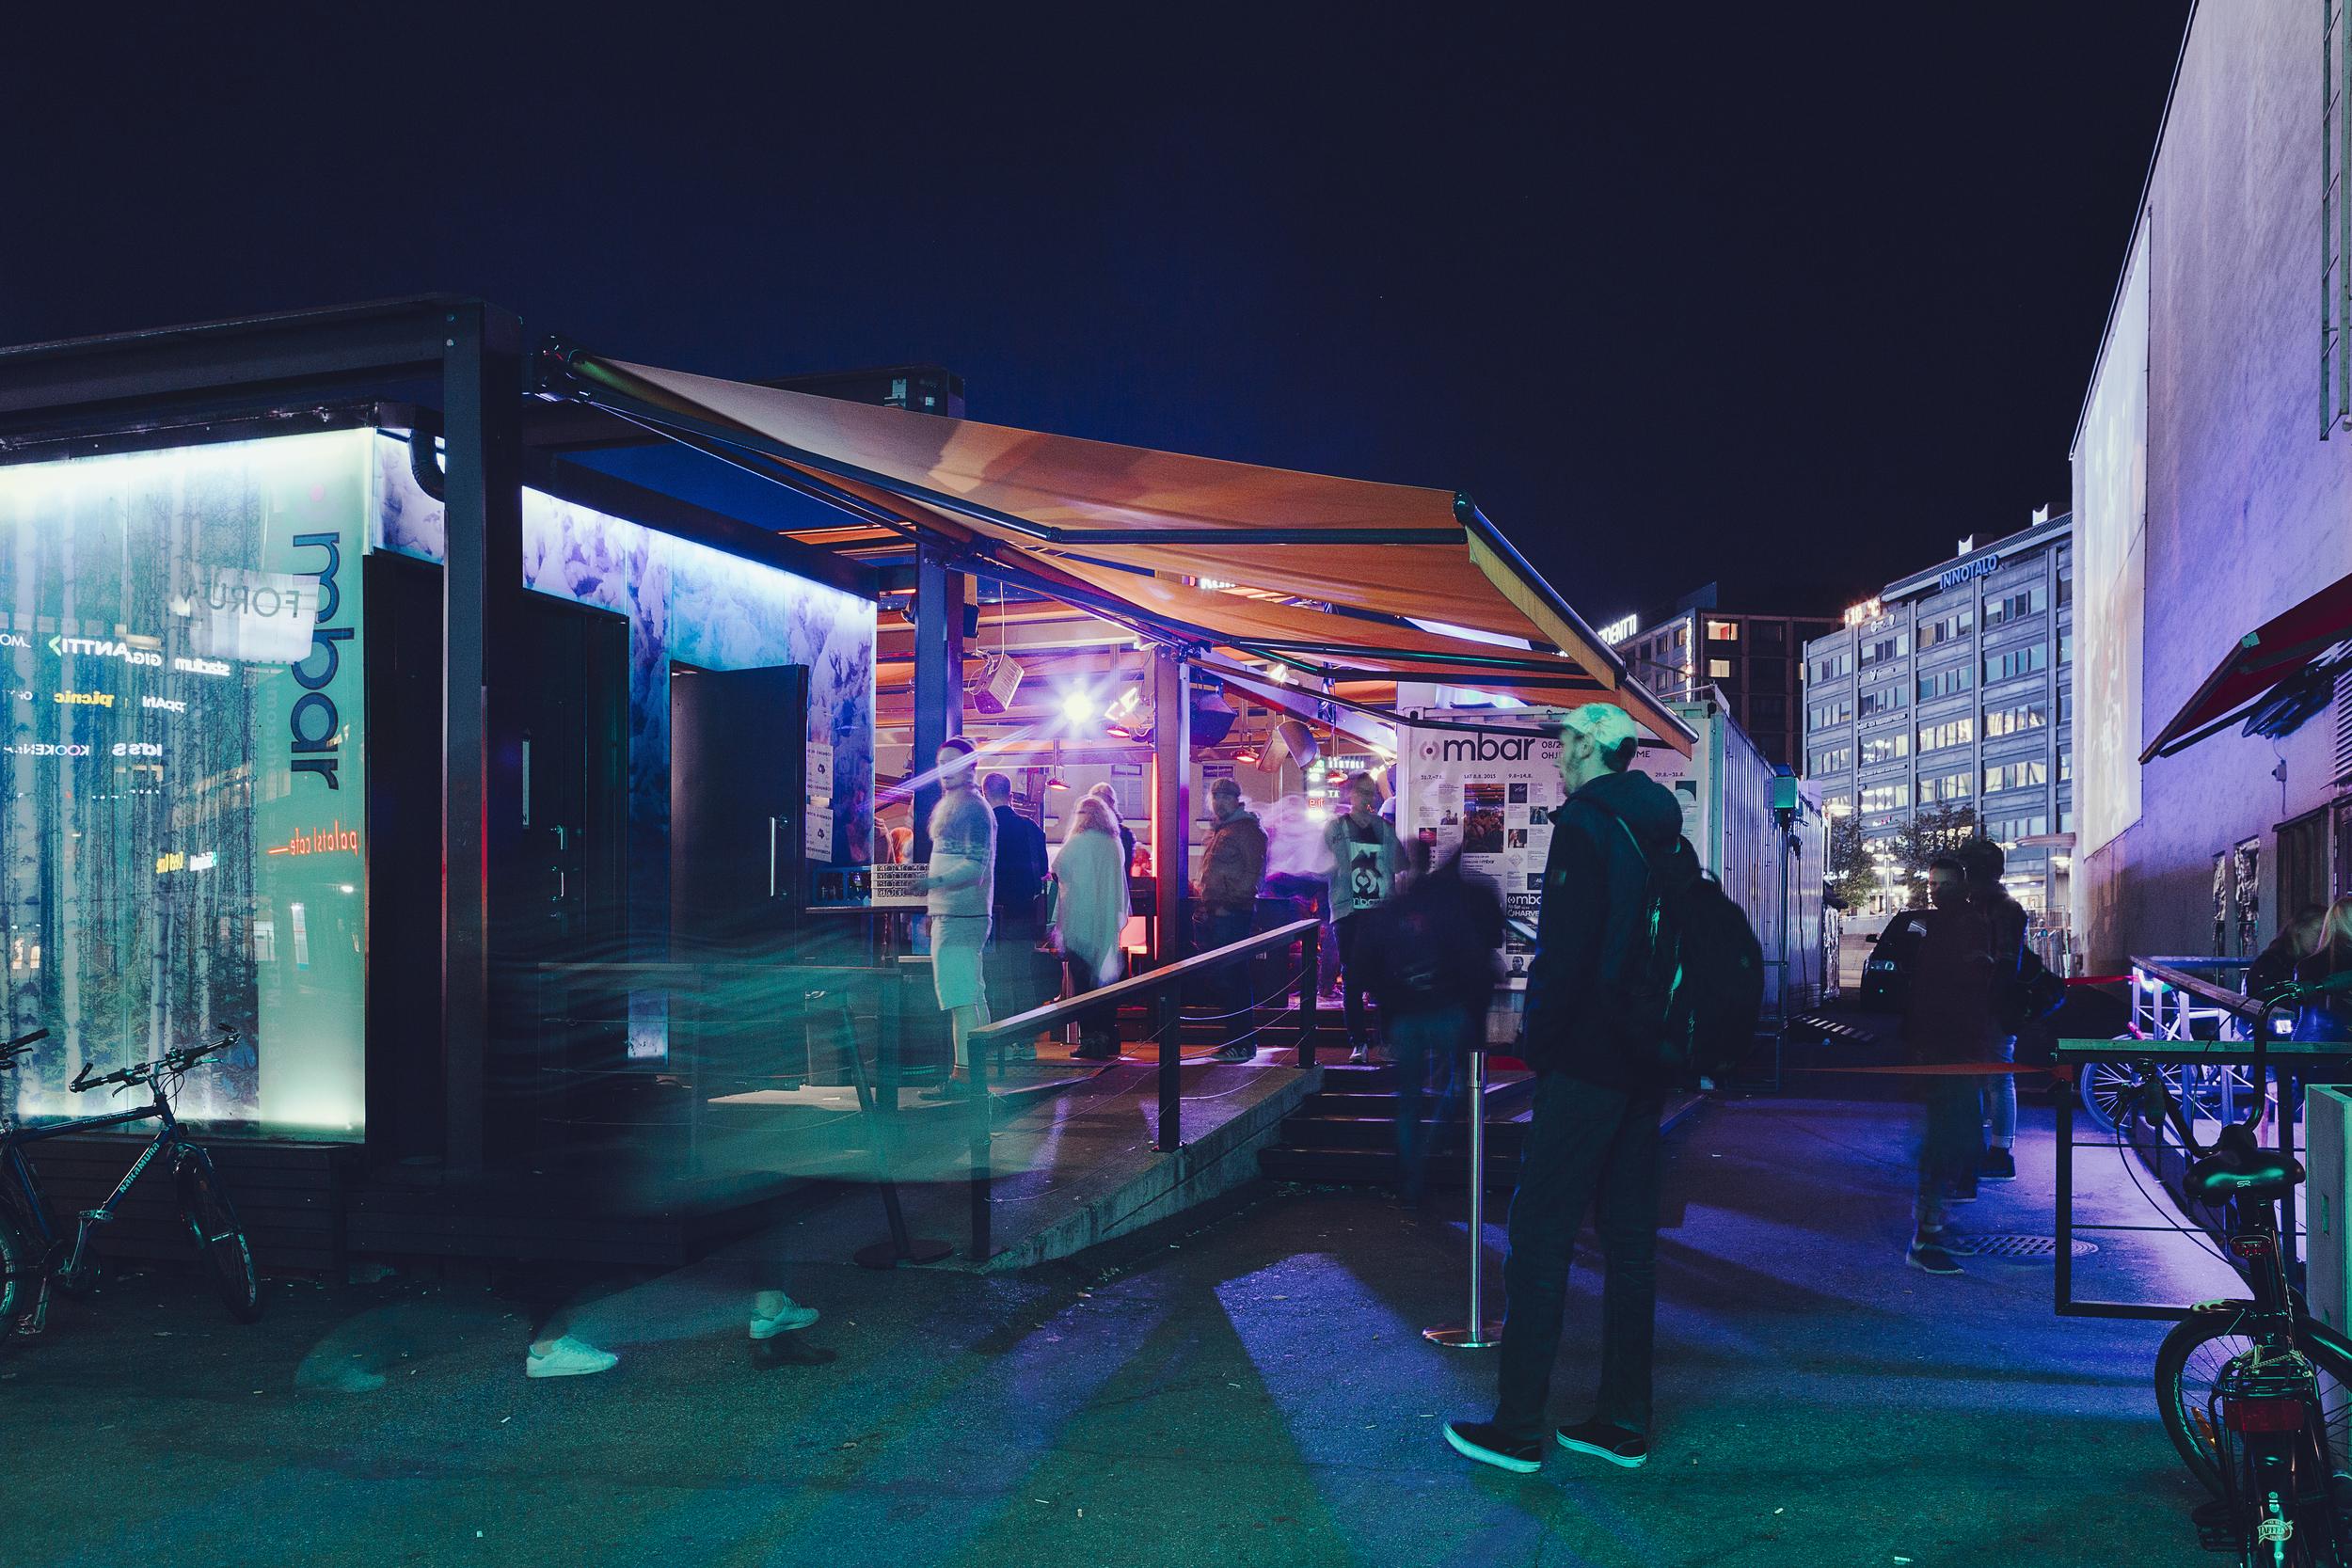 Mbar terrace night-time 2